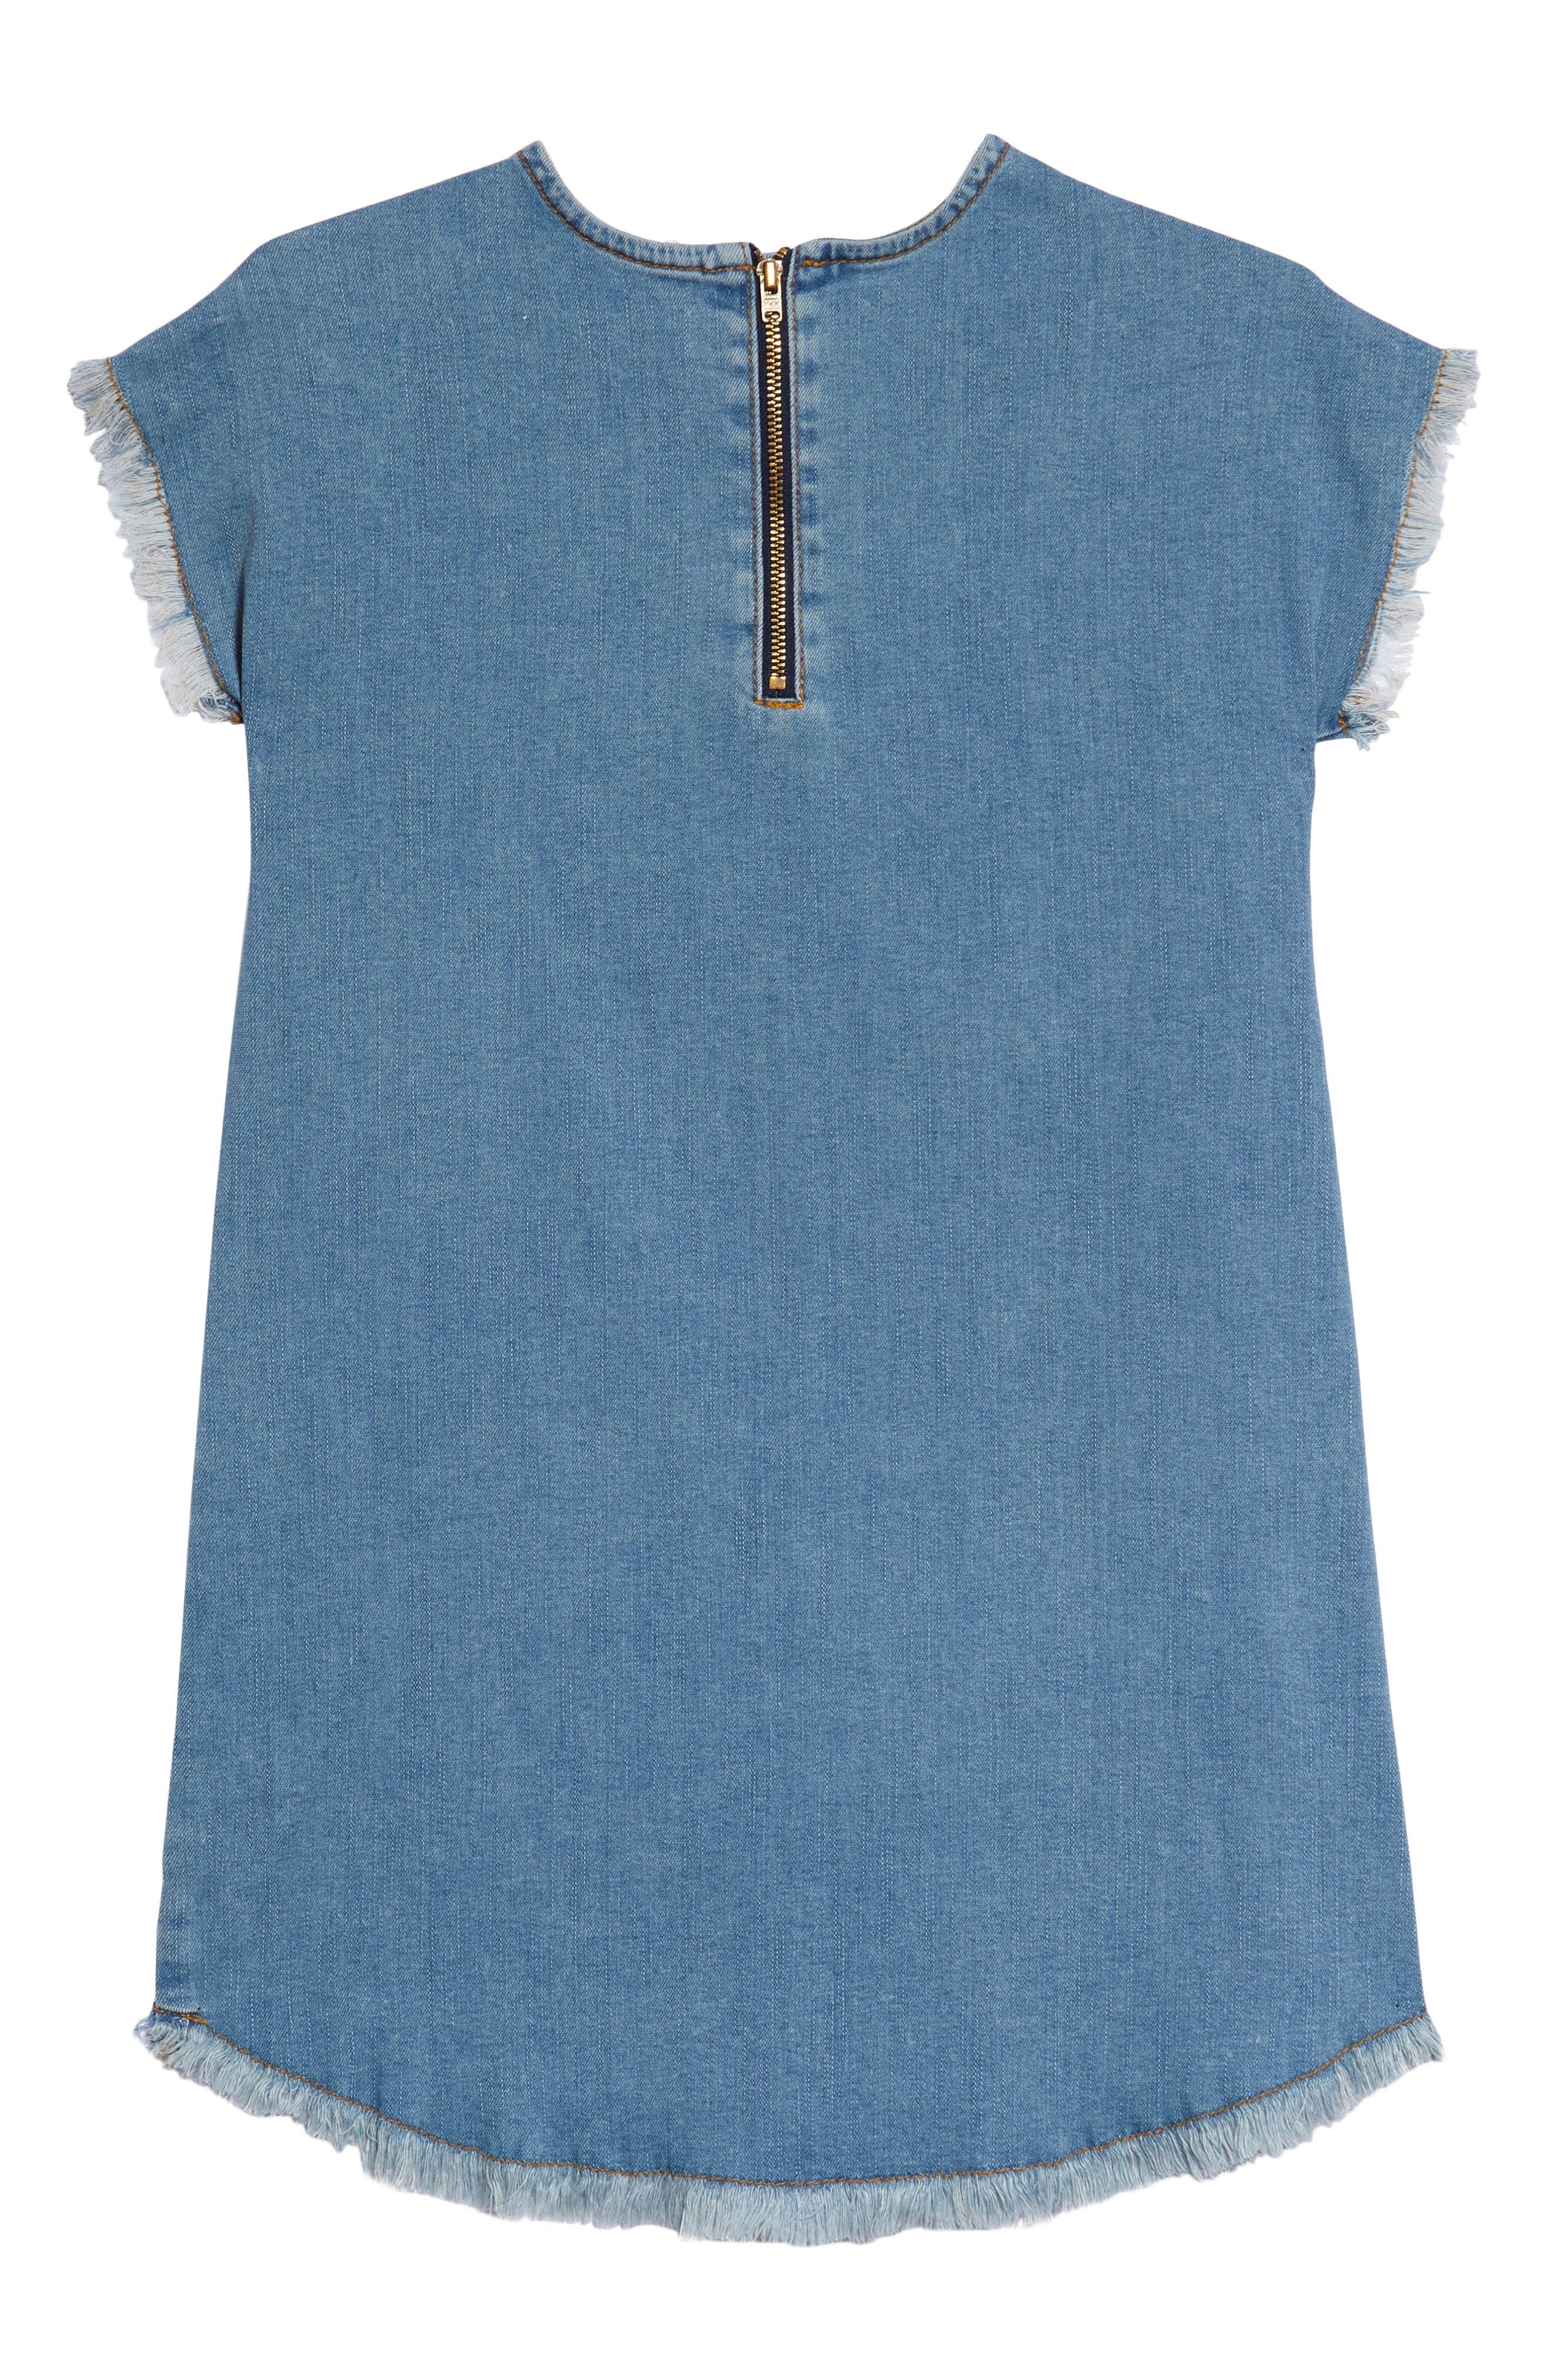 Embroidered Denim Shift Dress,                             Alternate thumbnail 2, color,                             420